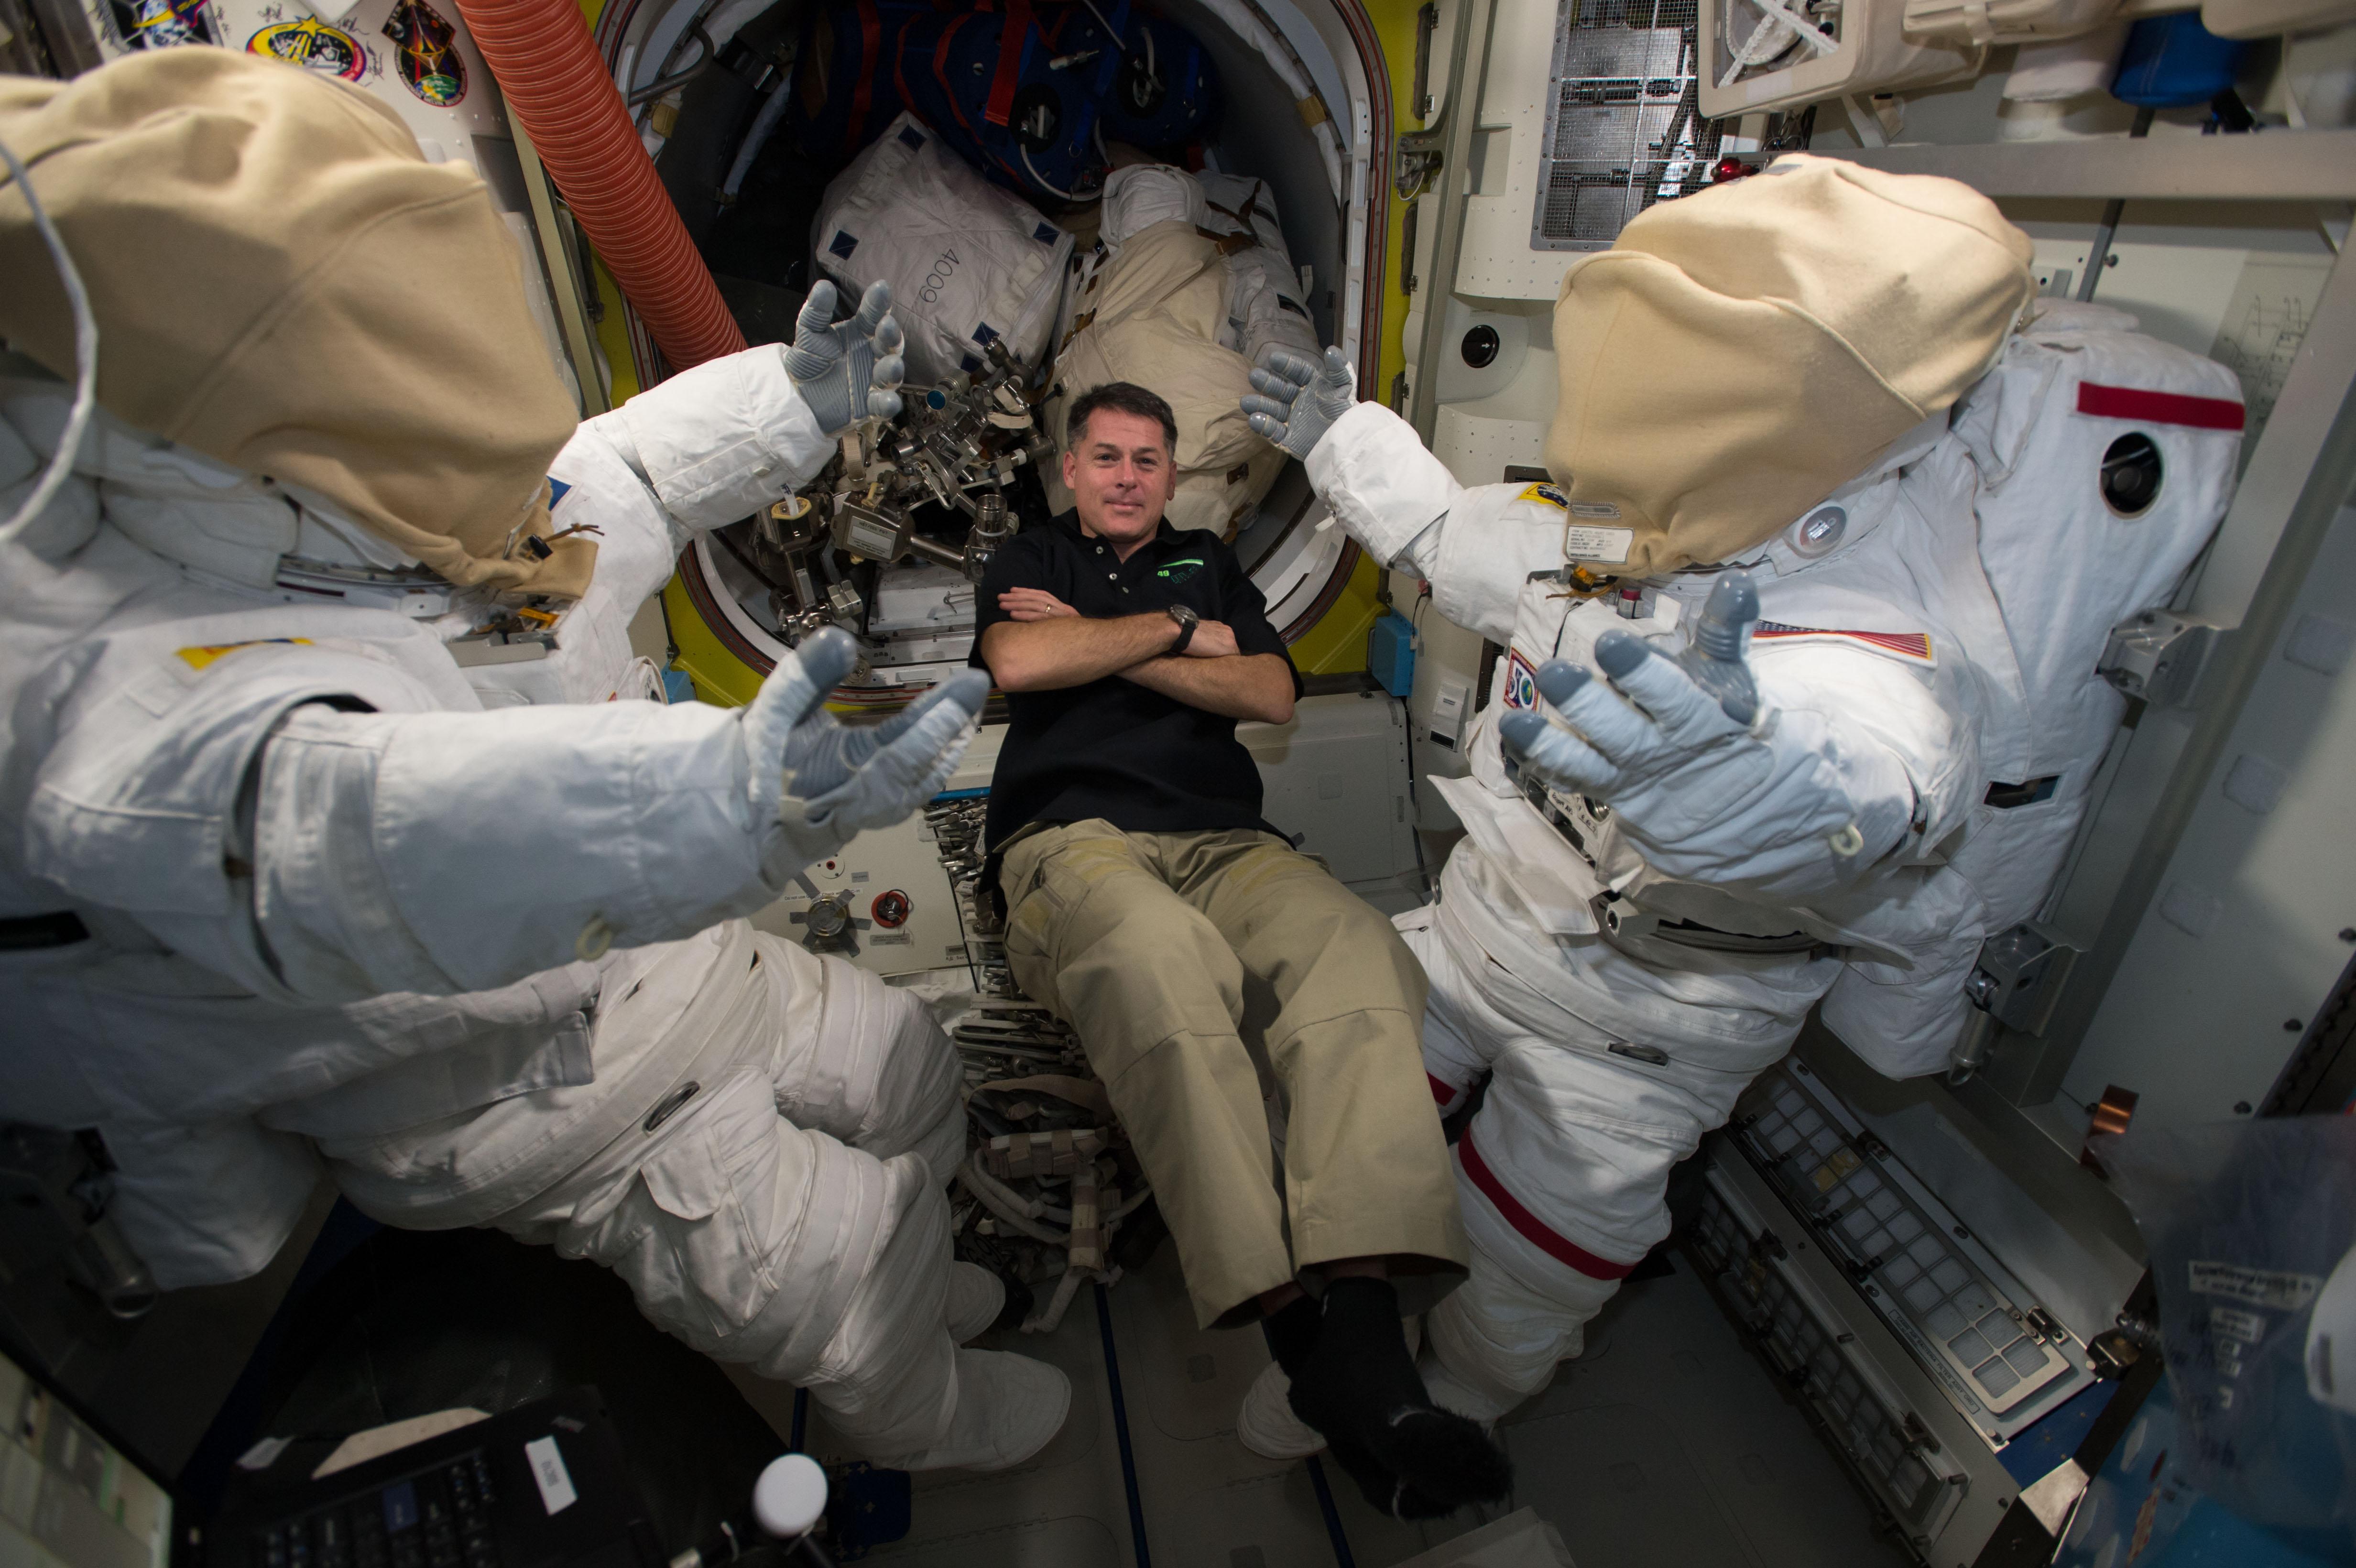 Can Astronauts Masturbate In Space